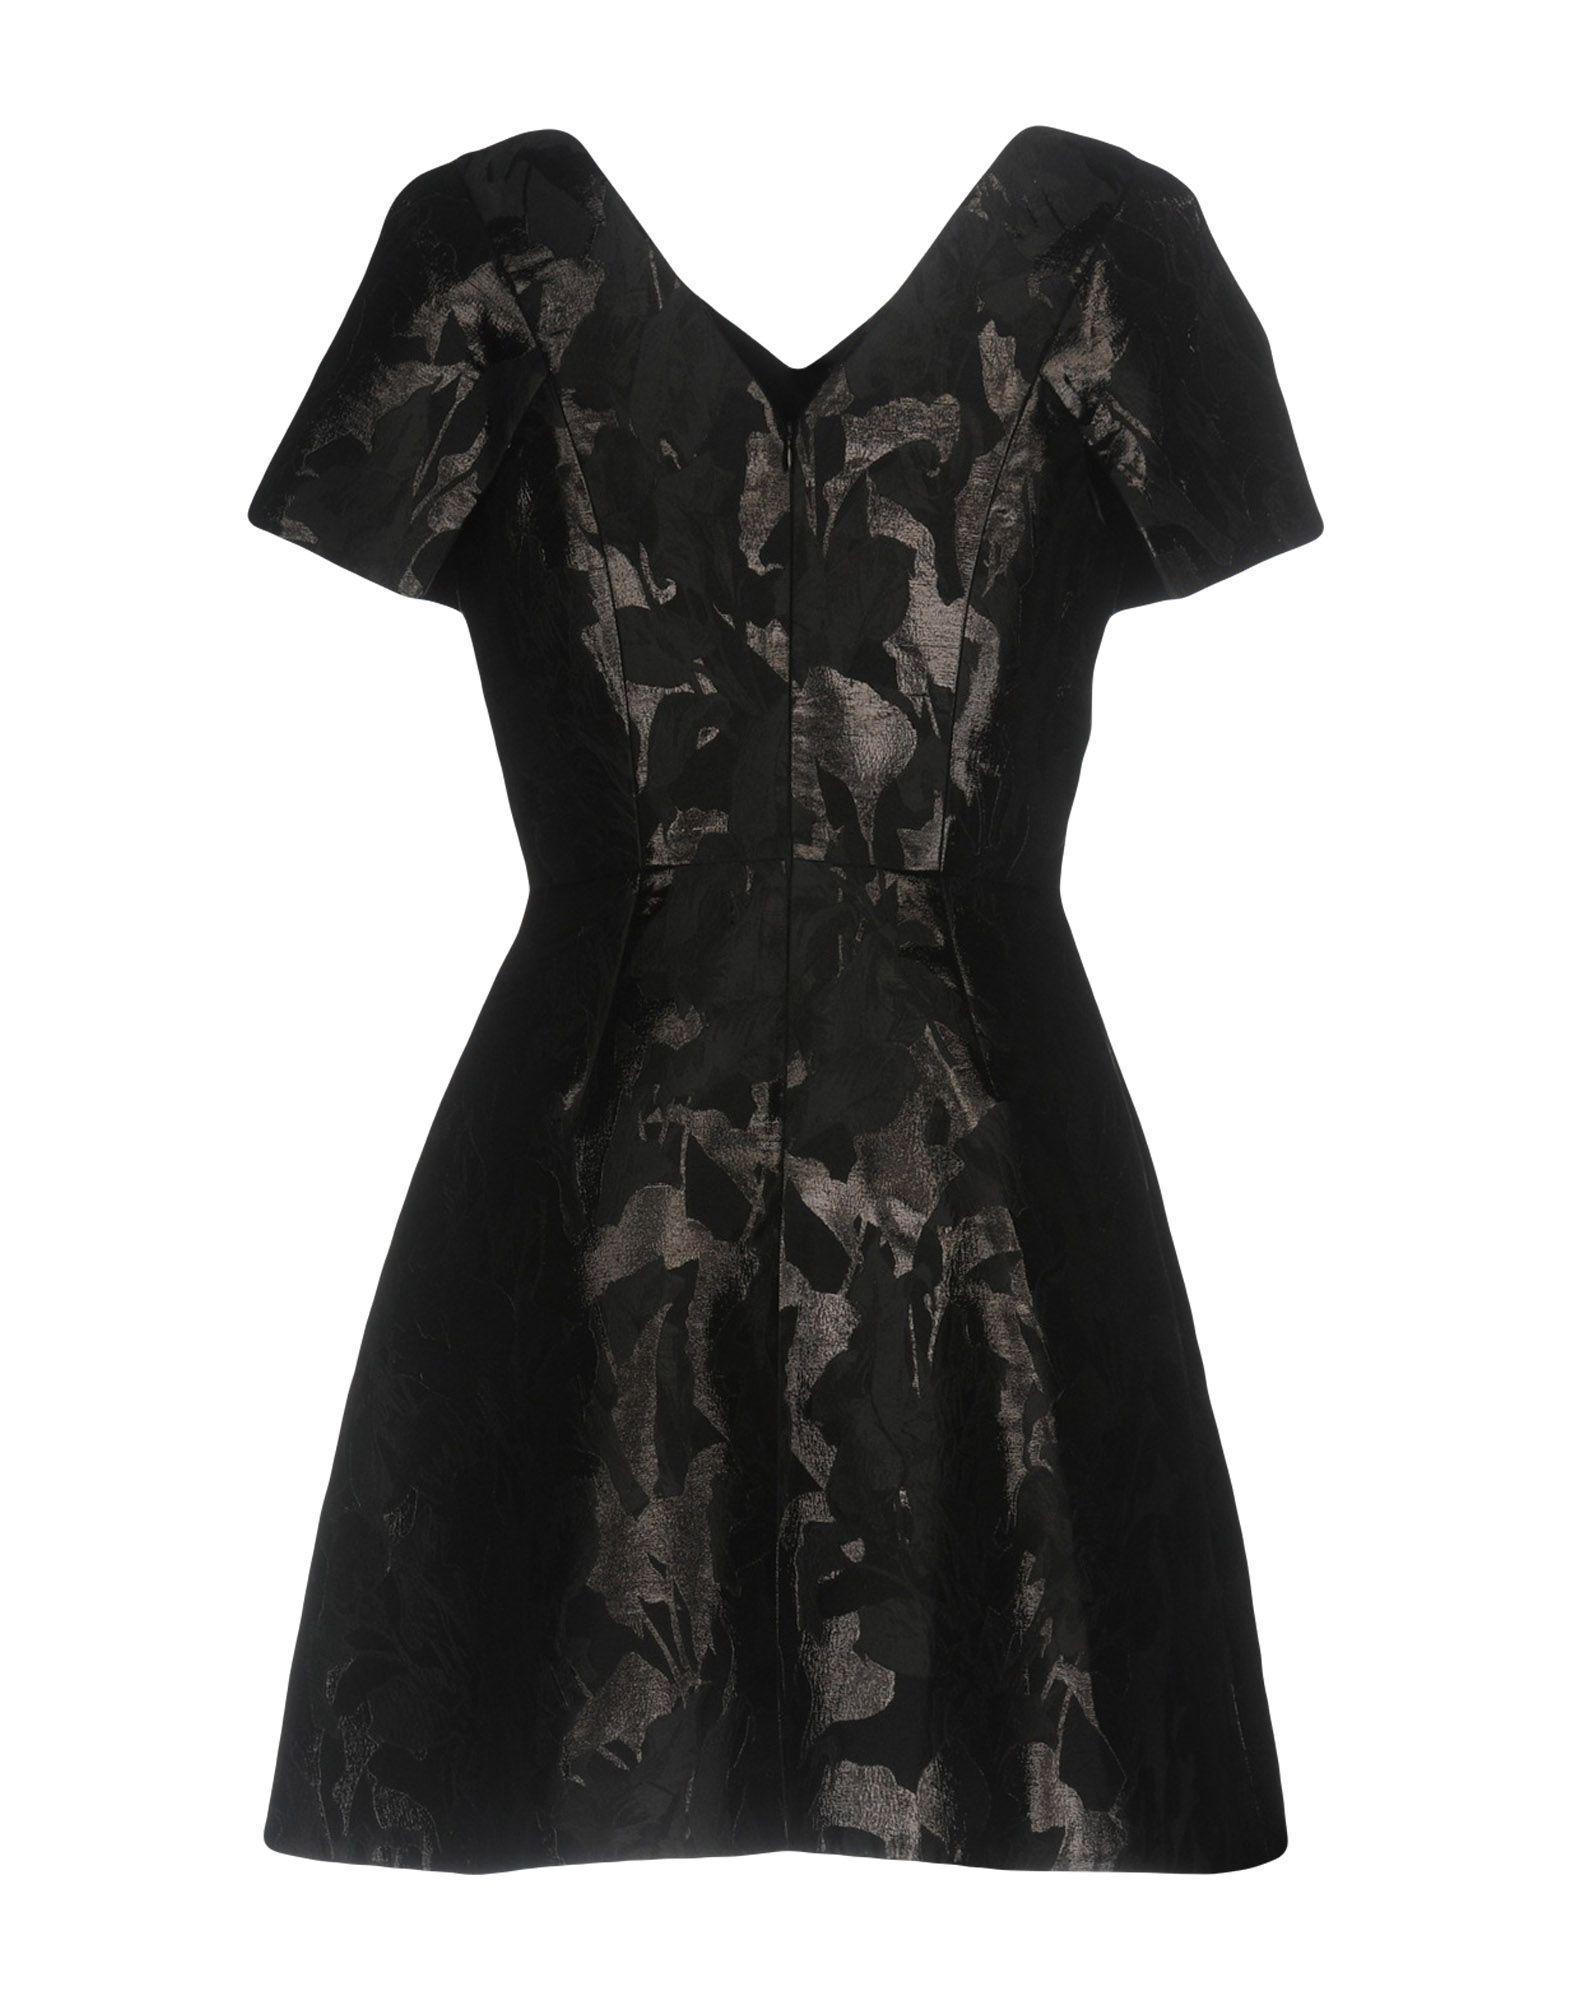 Peter Pilotto Black Cotton Jacquard Dress